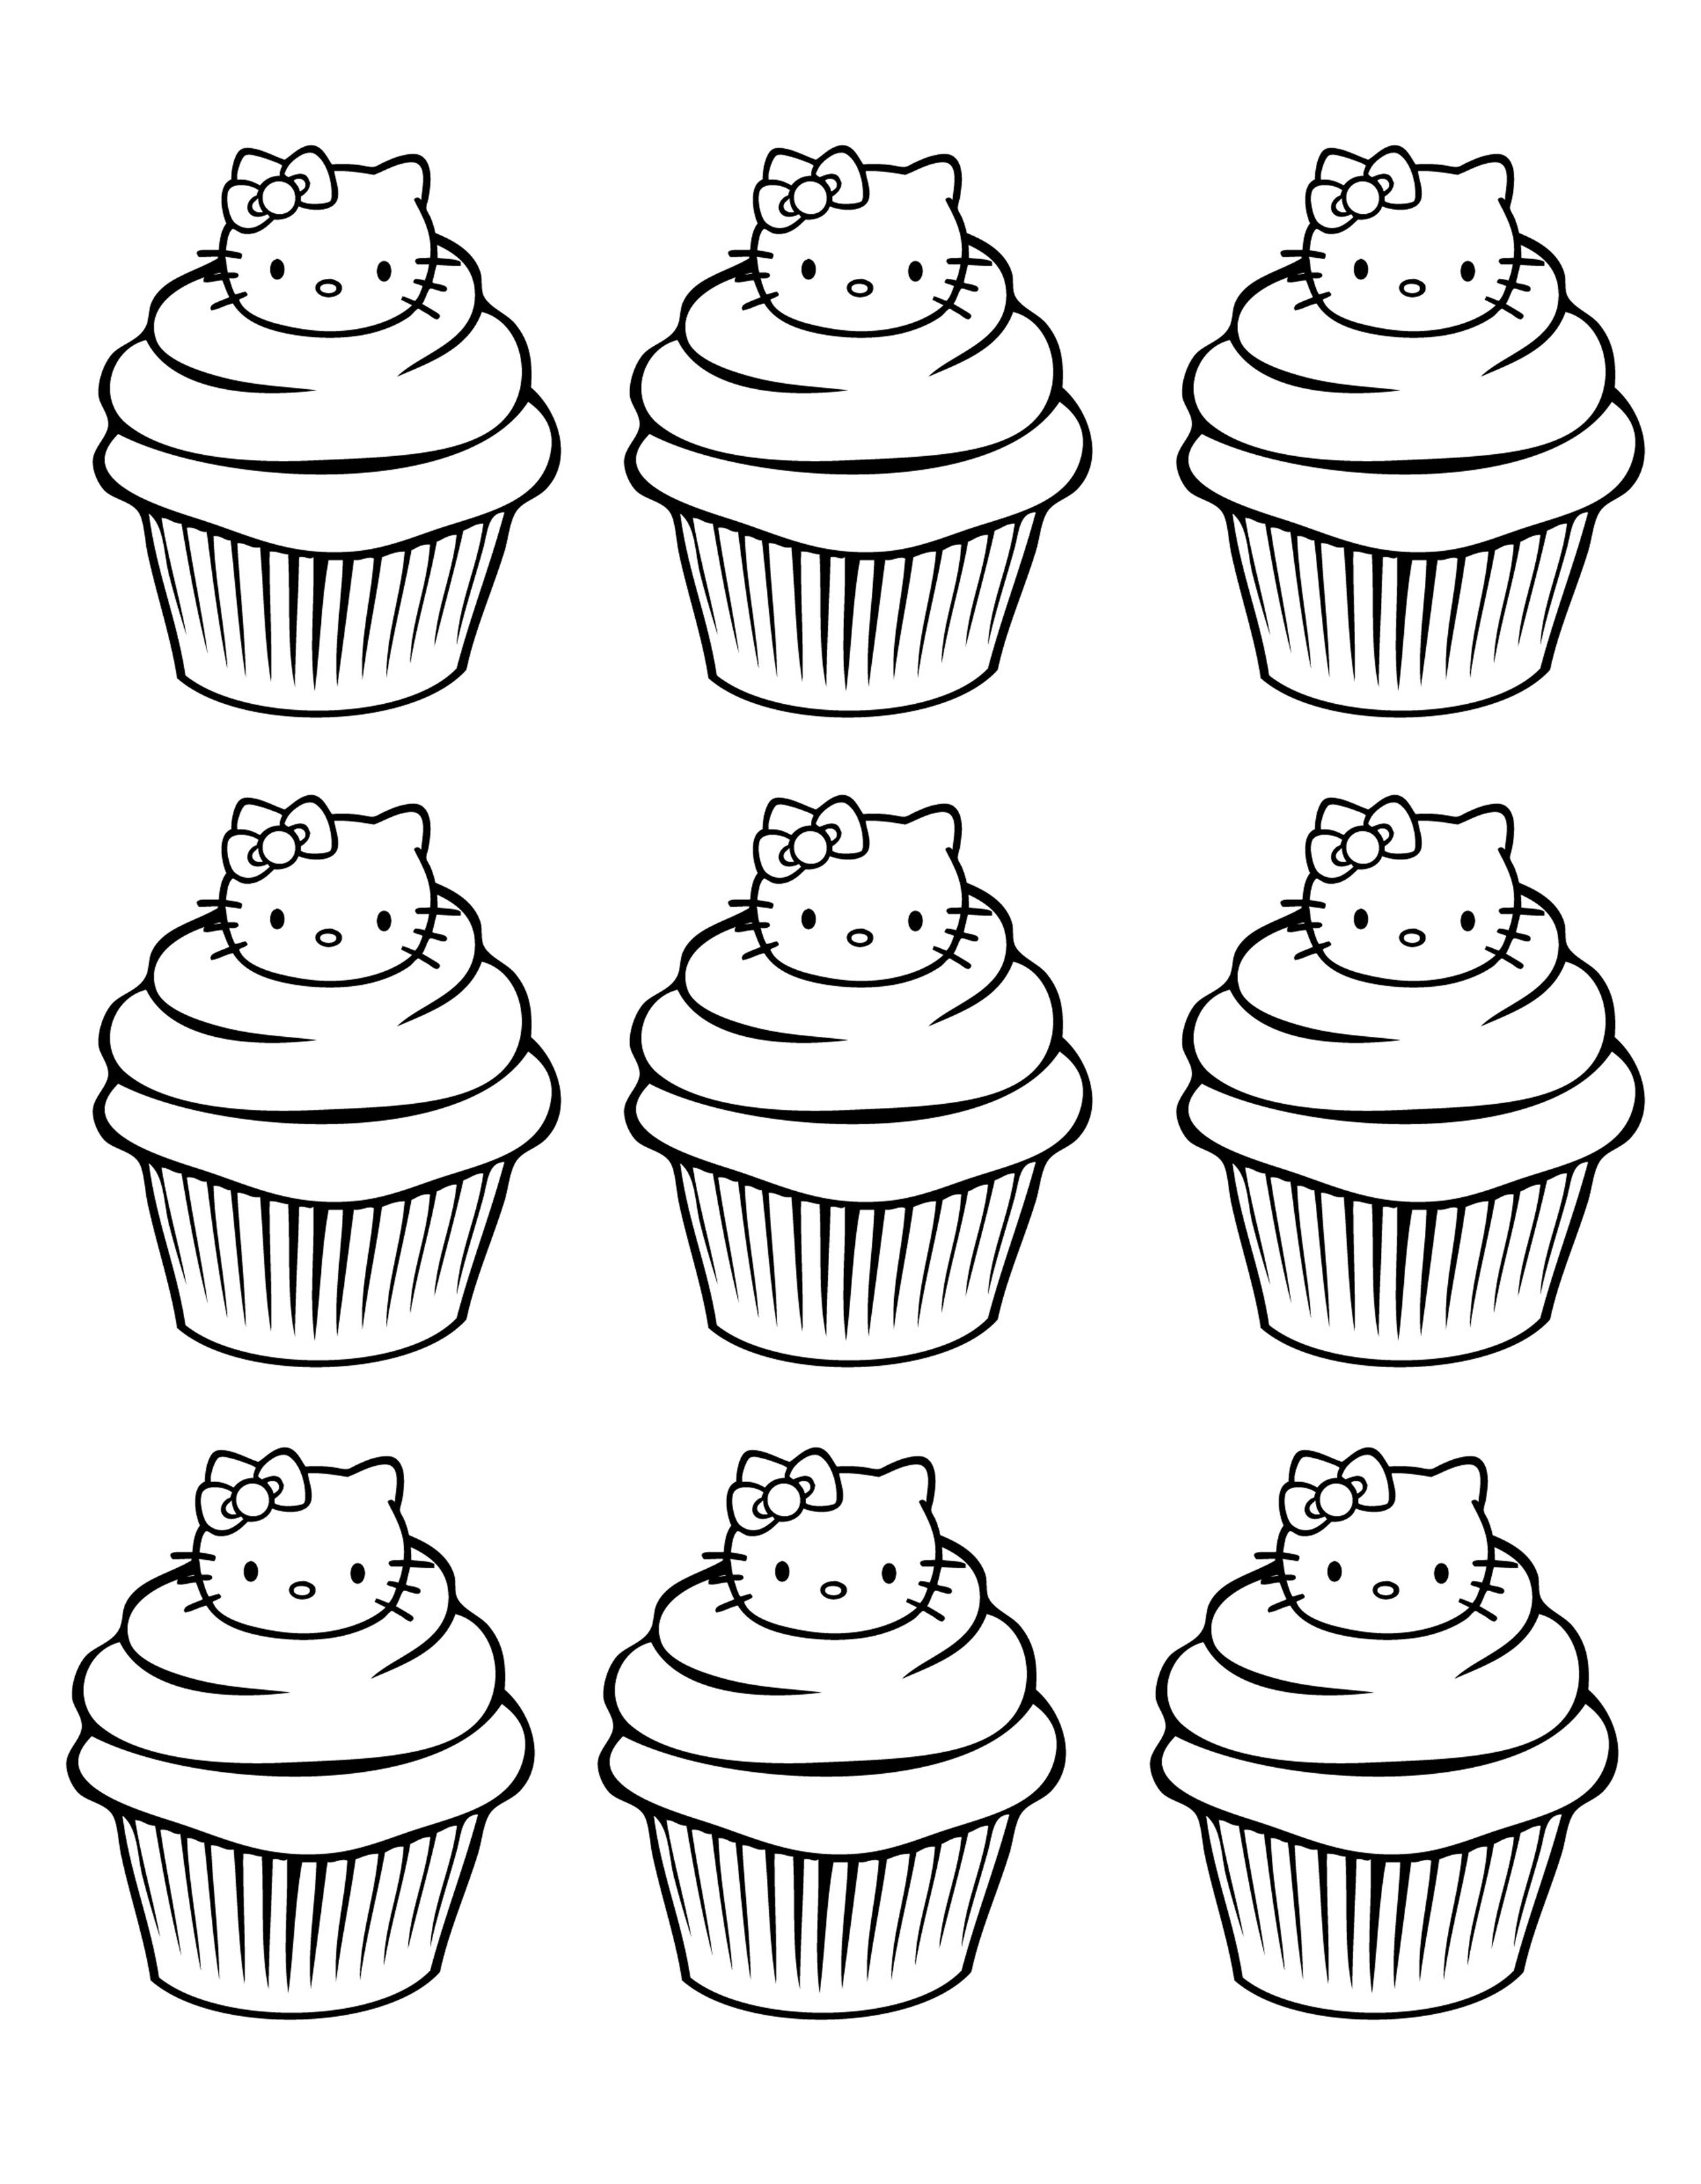 Cupcakes hello kitty simple Cupcakes